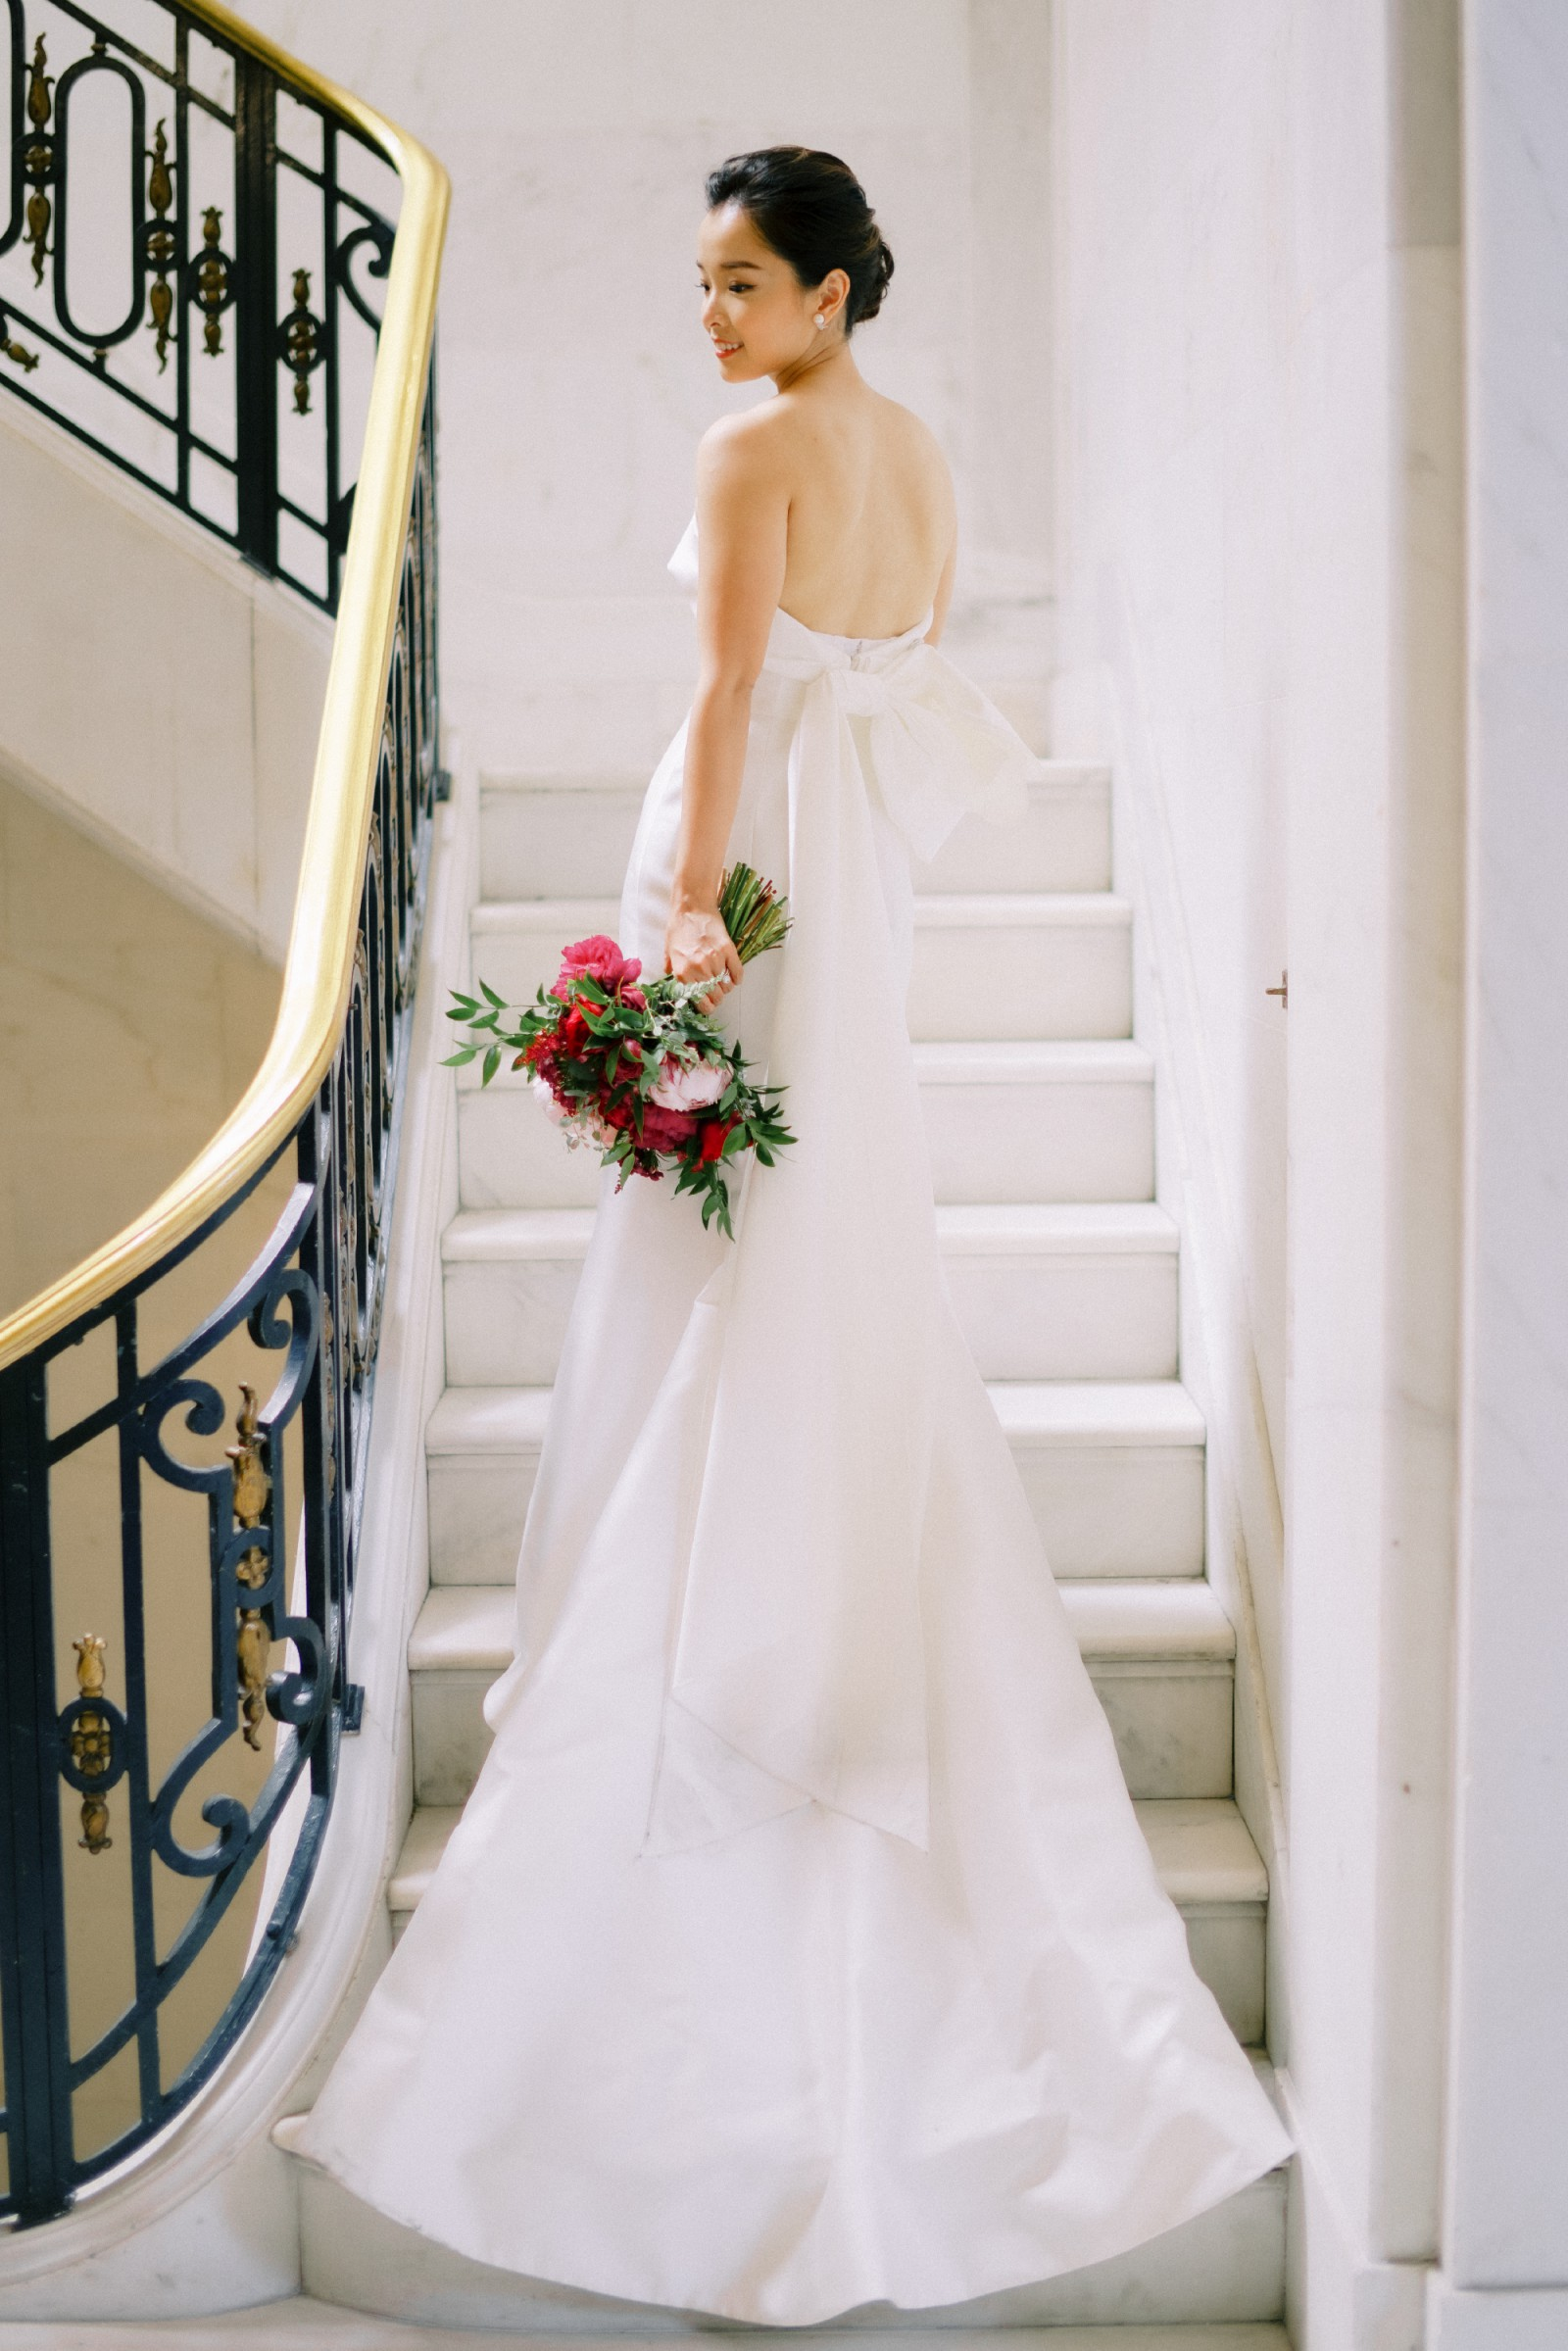 Carolina Herrera Hunter Gown Used Wedding Dress Stillwhite,Badgley Mischka Wedding Dress